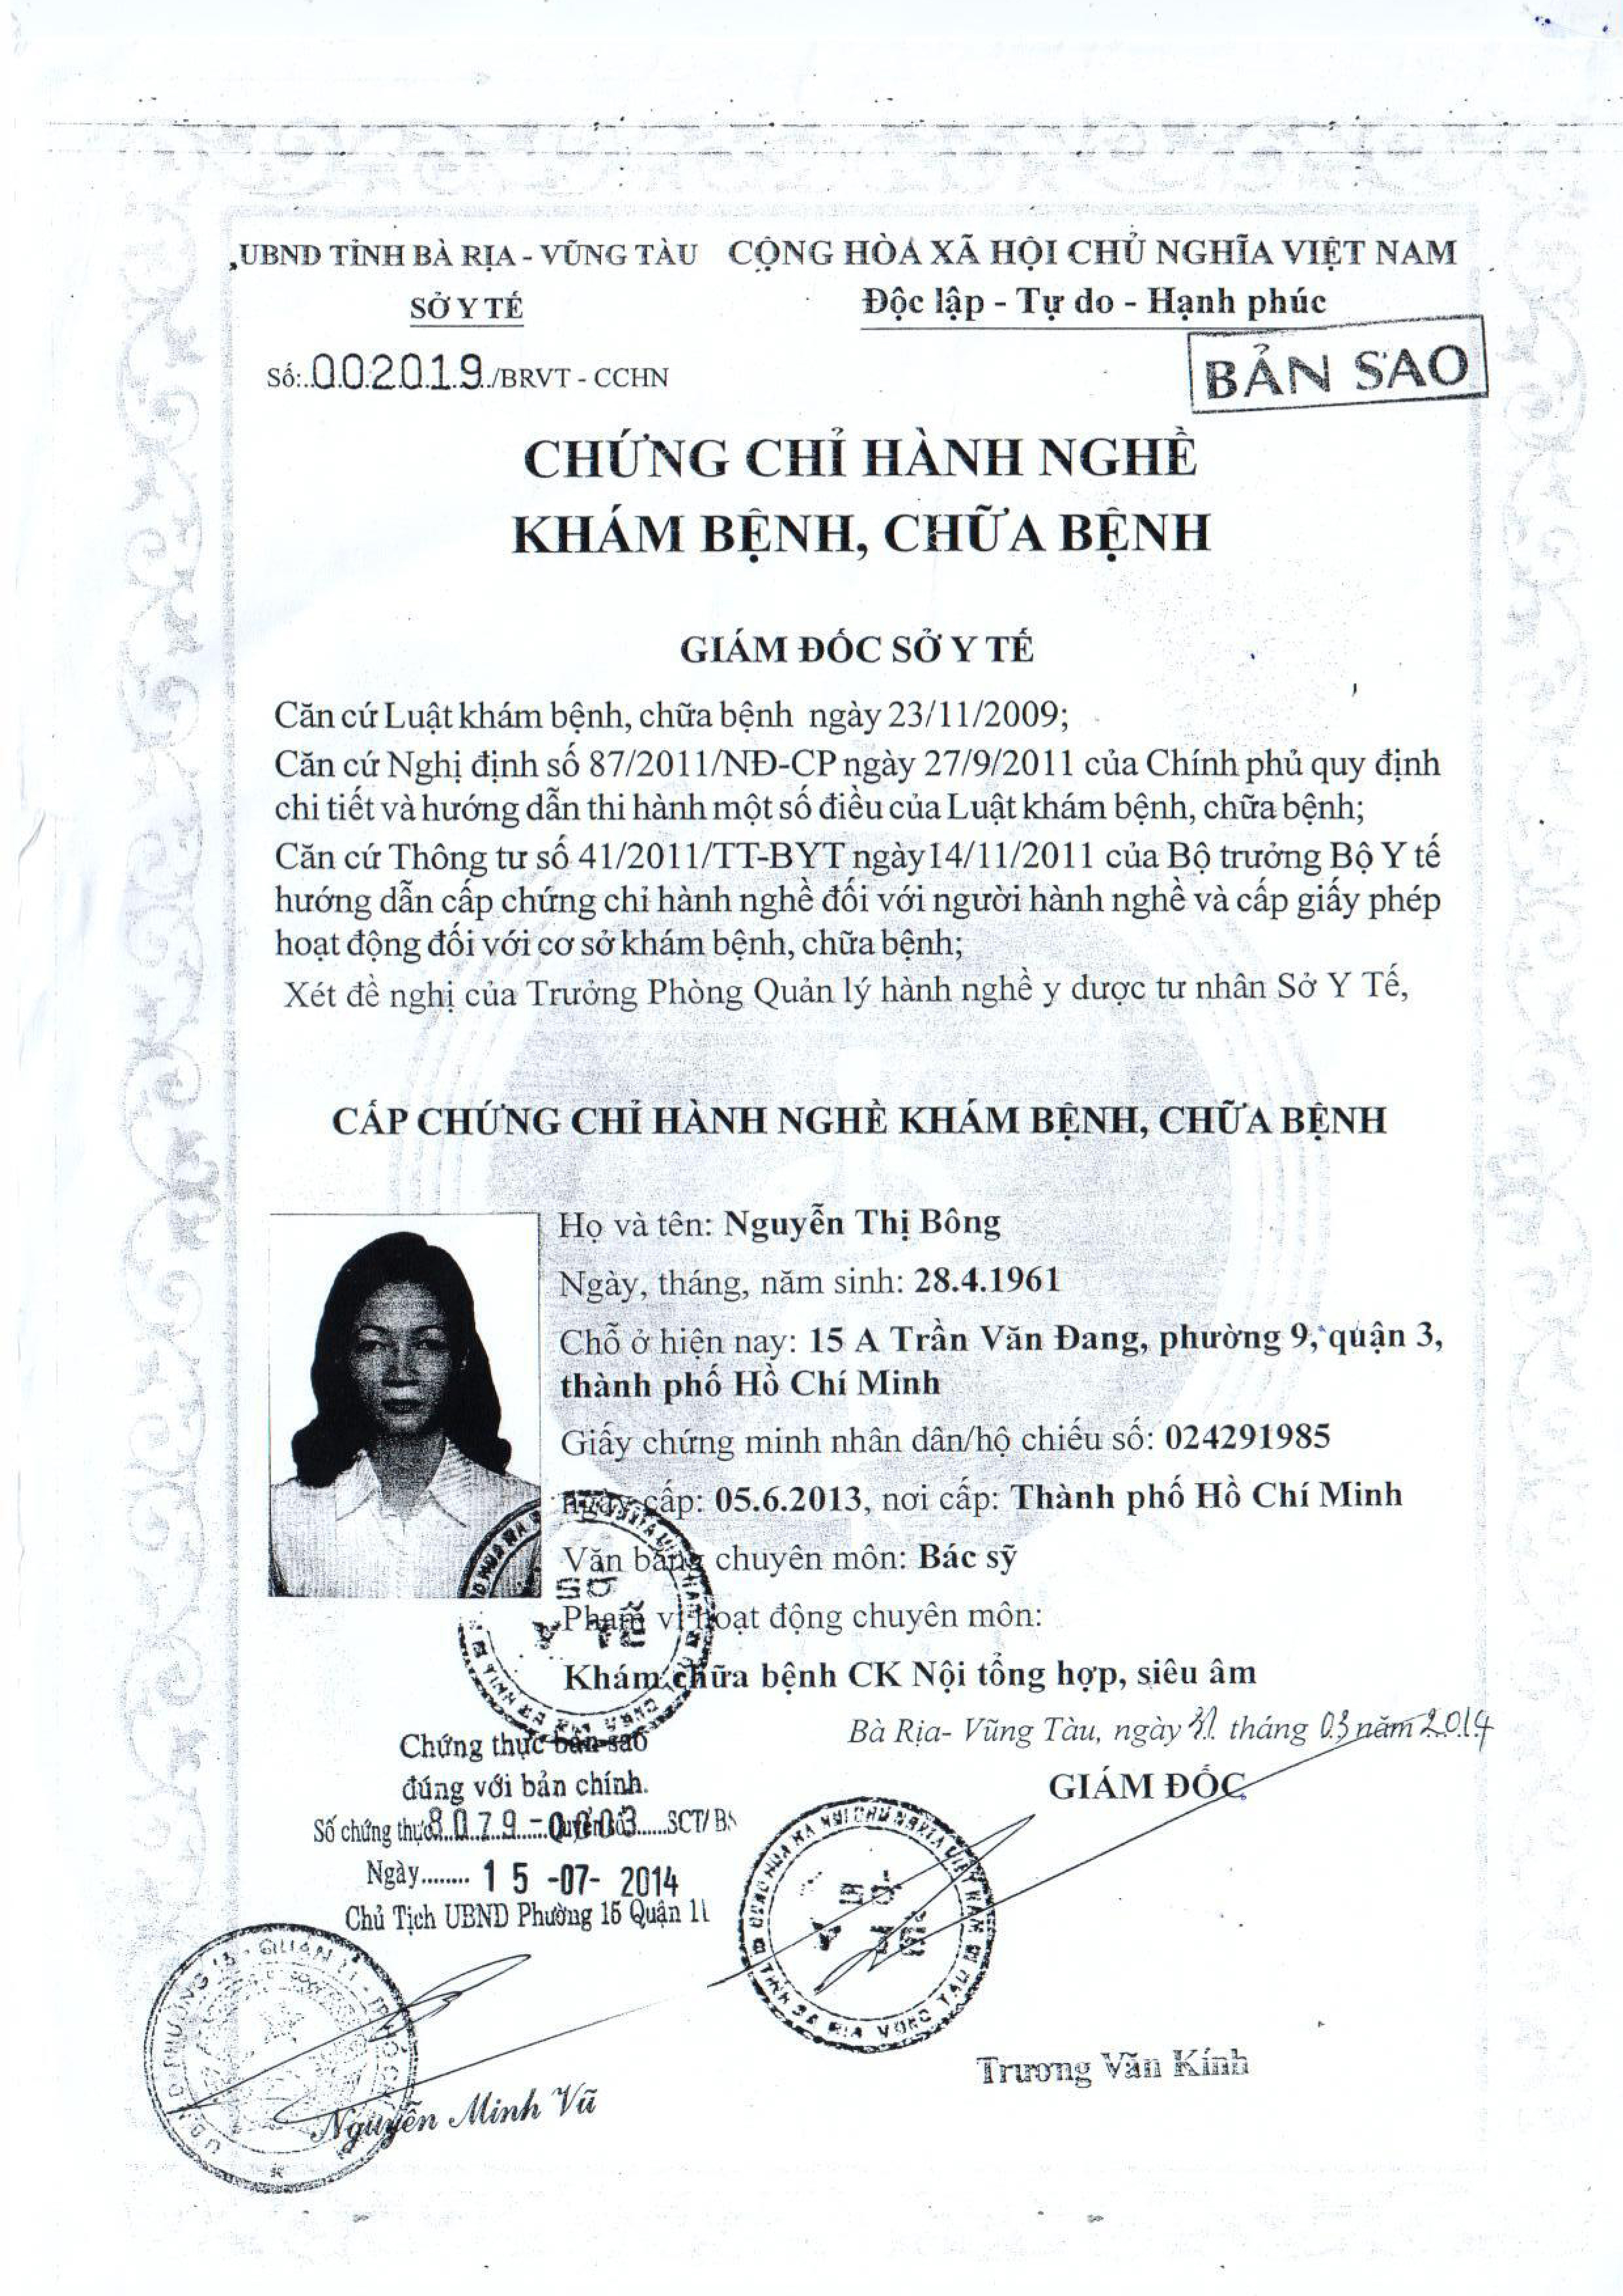 CCHN BS NGUYEN THI BONG-TAIMUIHONGSG.JPG